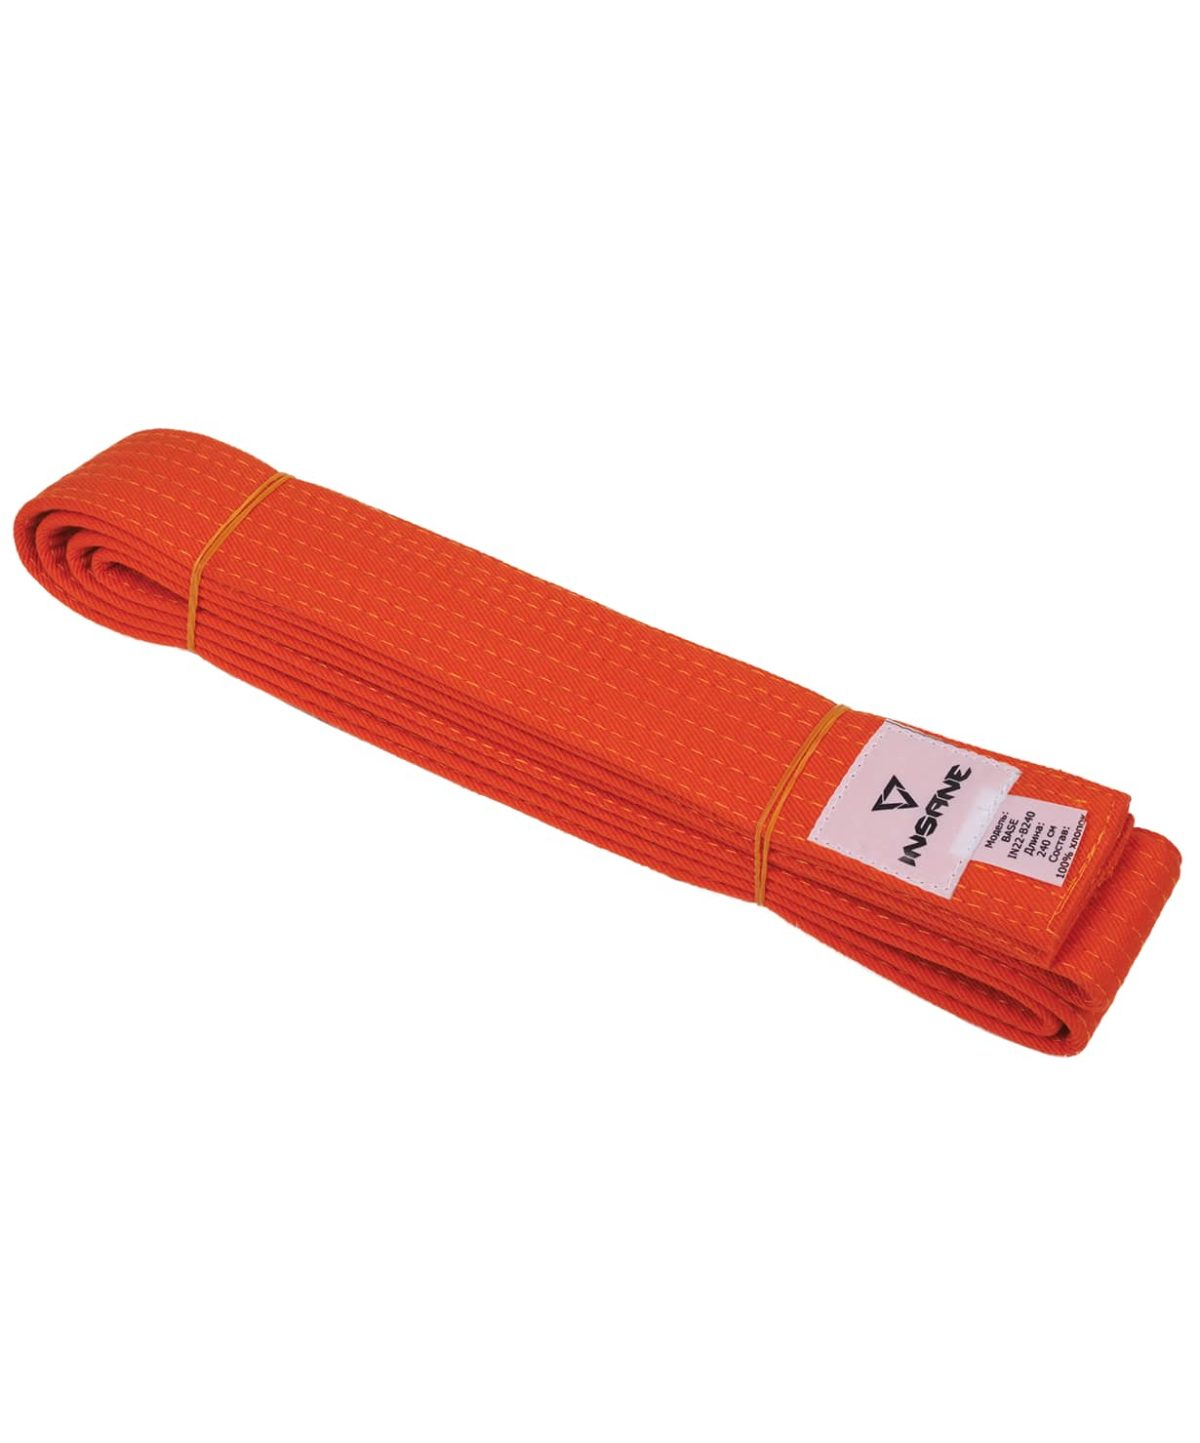 INSANE Пояс для единобоств BASE х/б, 240 см  IN22-B240: оранжевый - 1